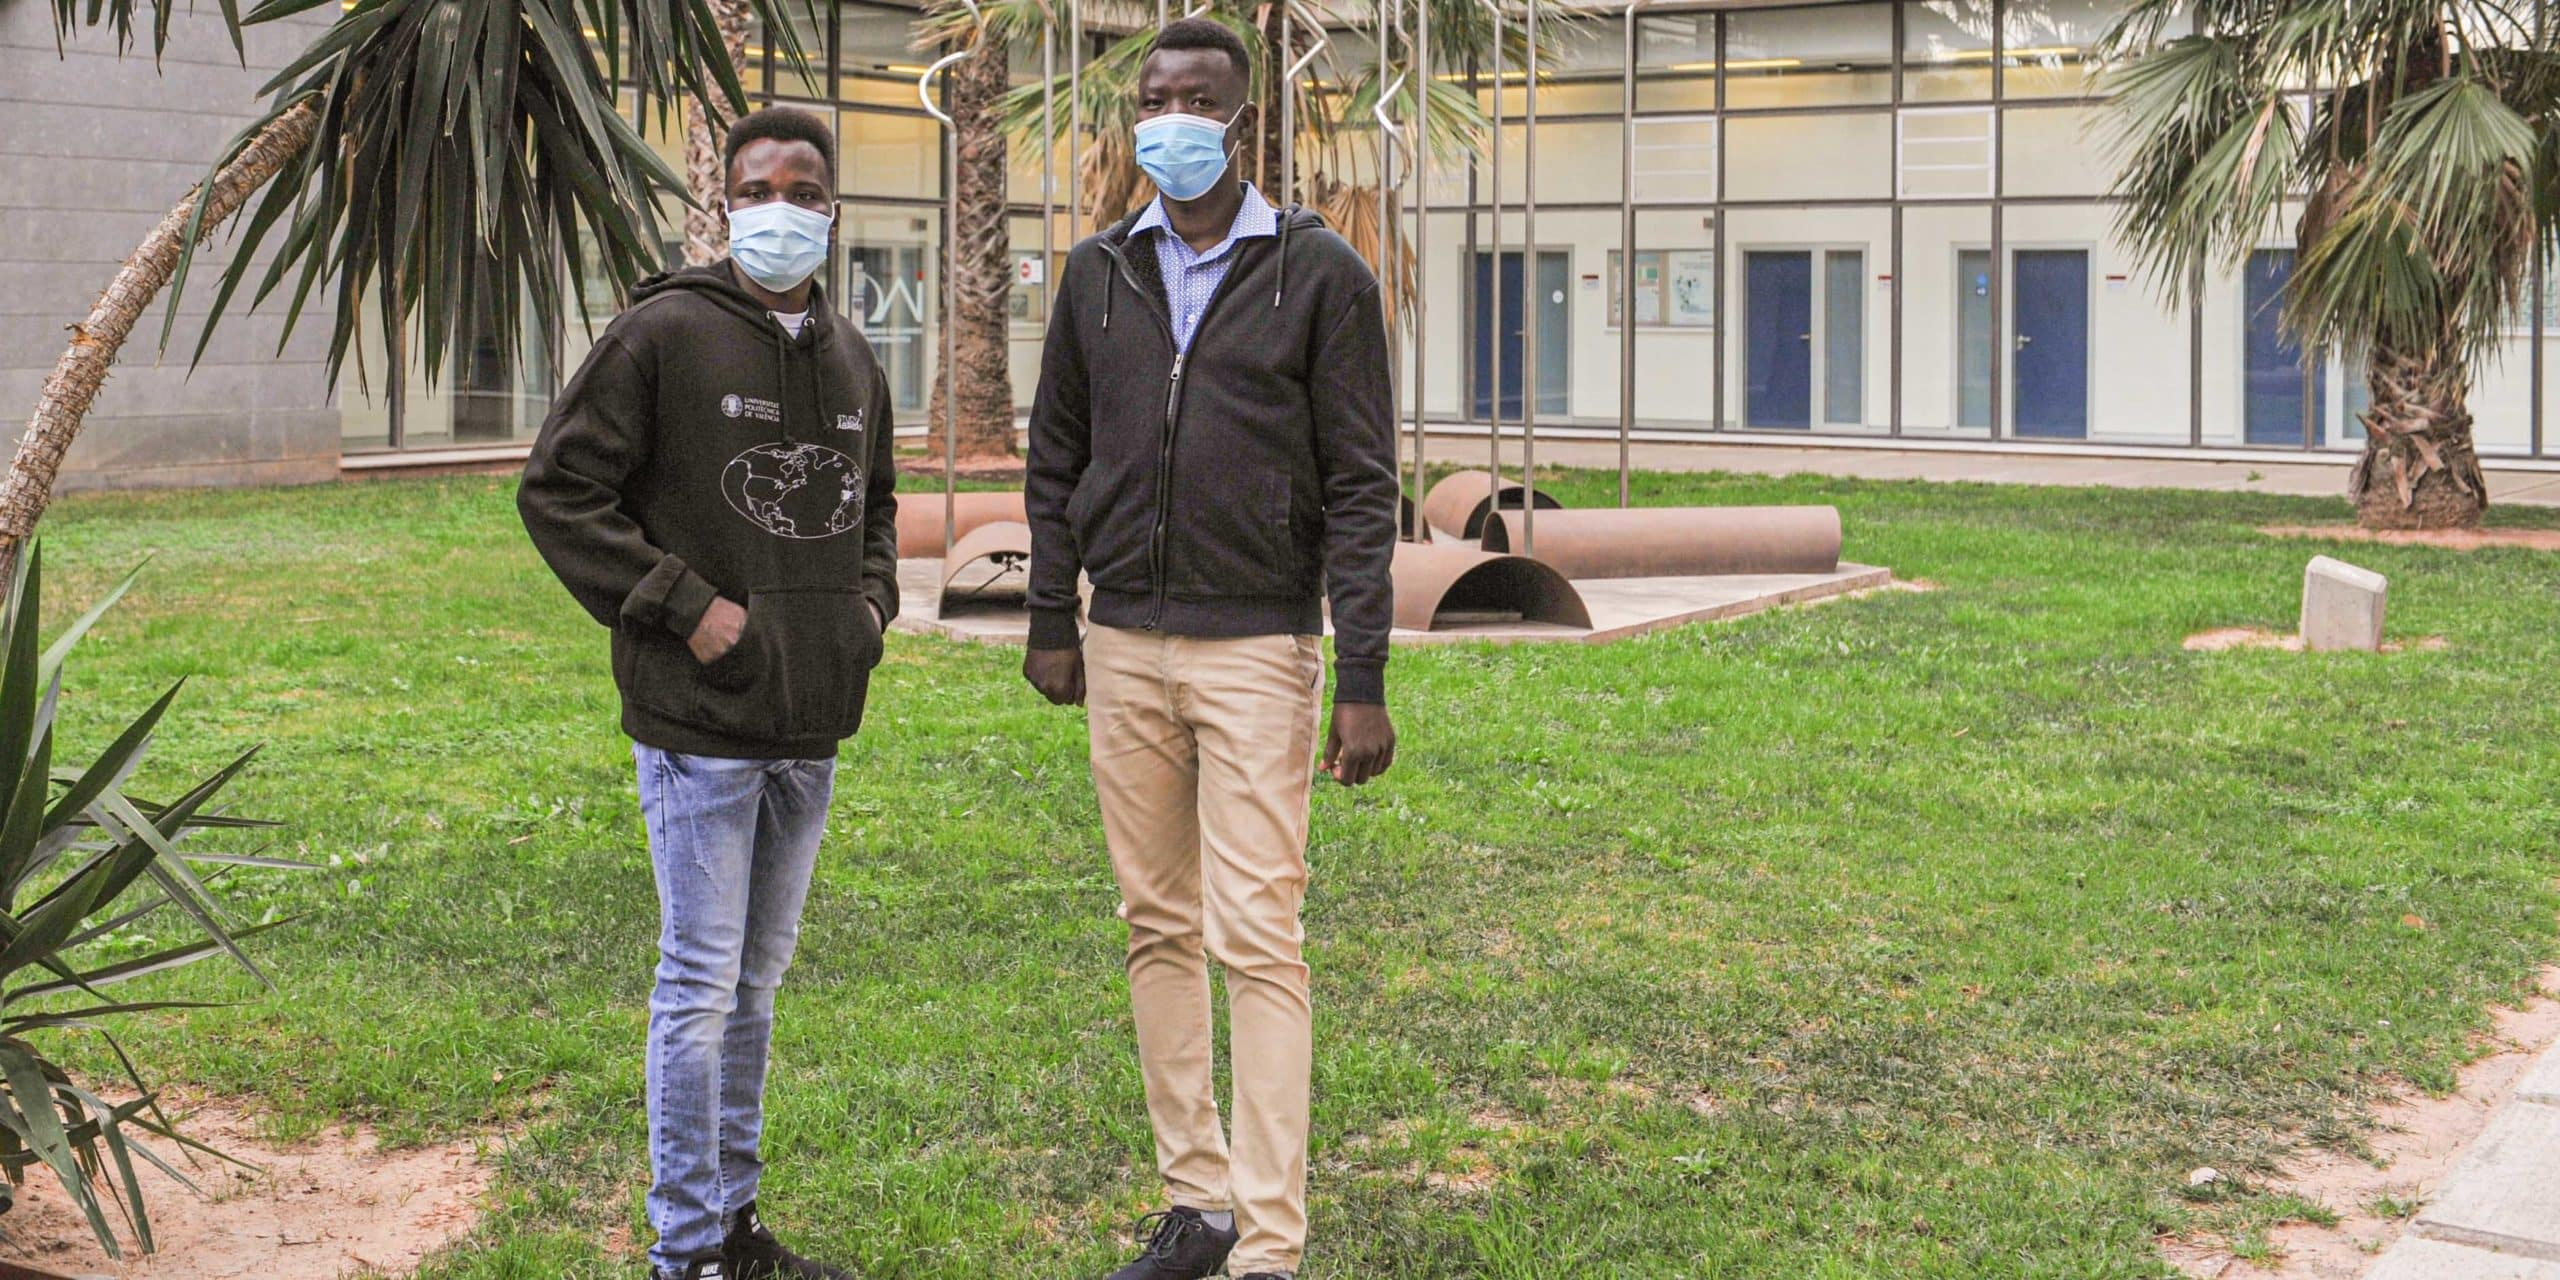 sudan estudiantes UPV erasmus comboni